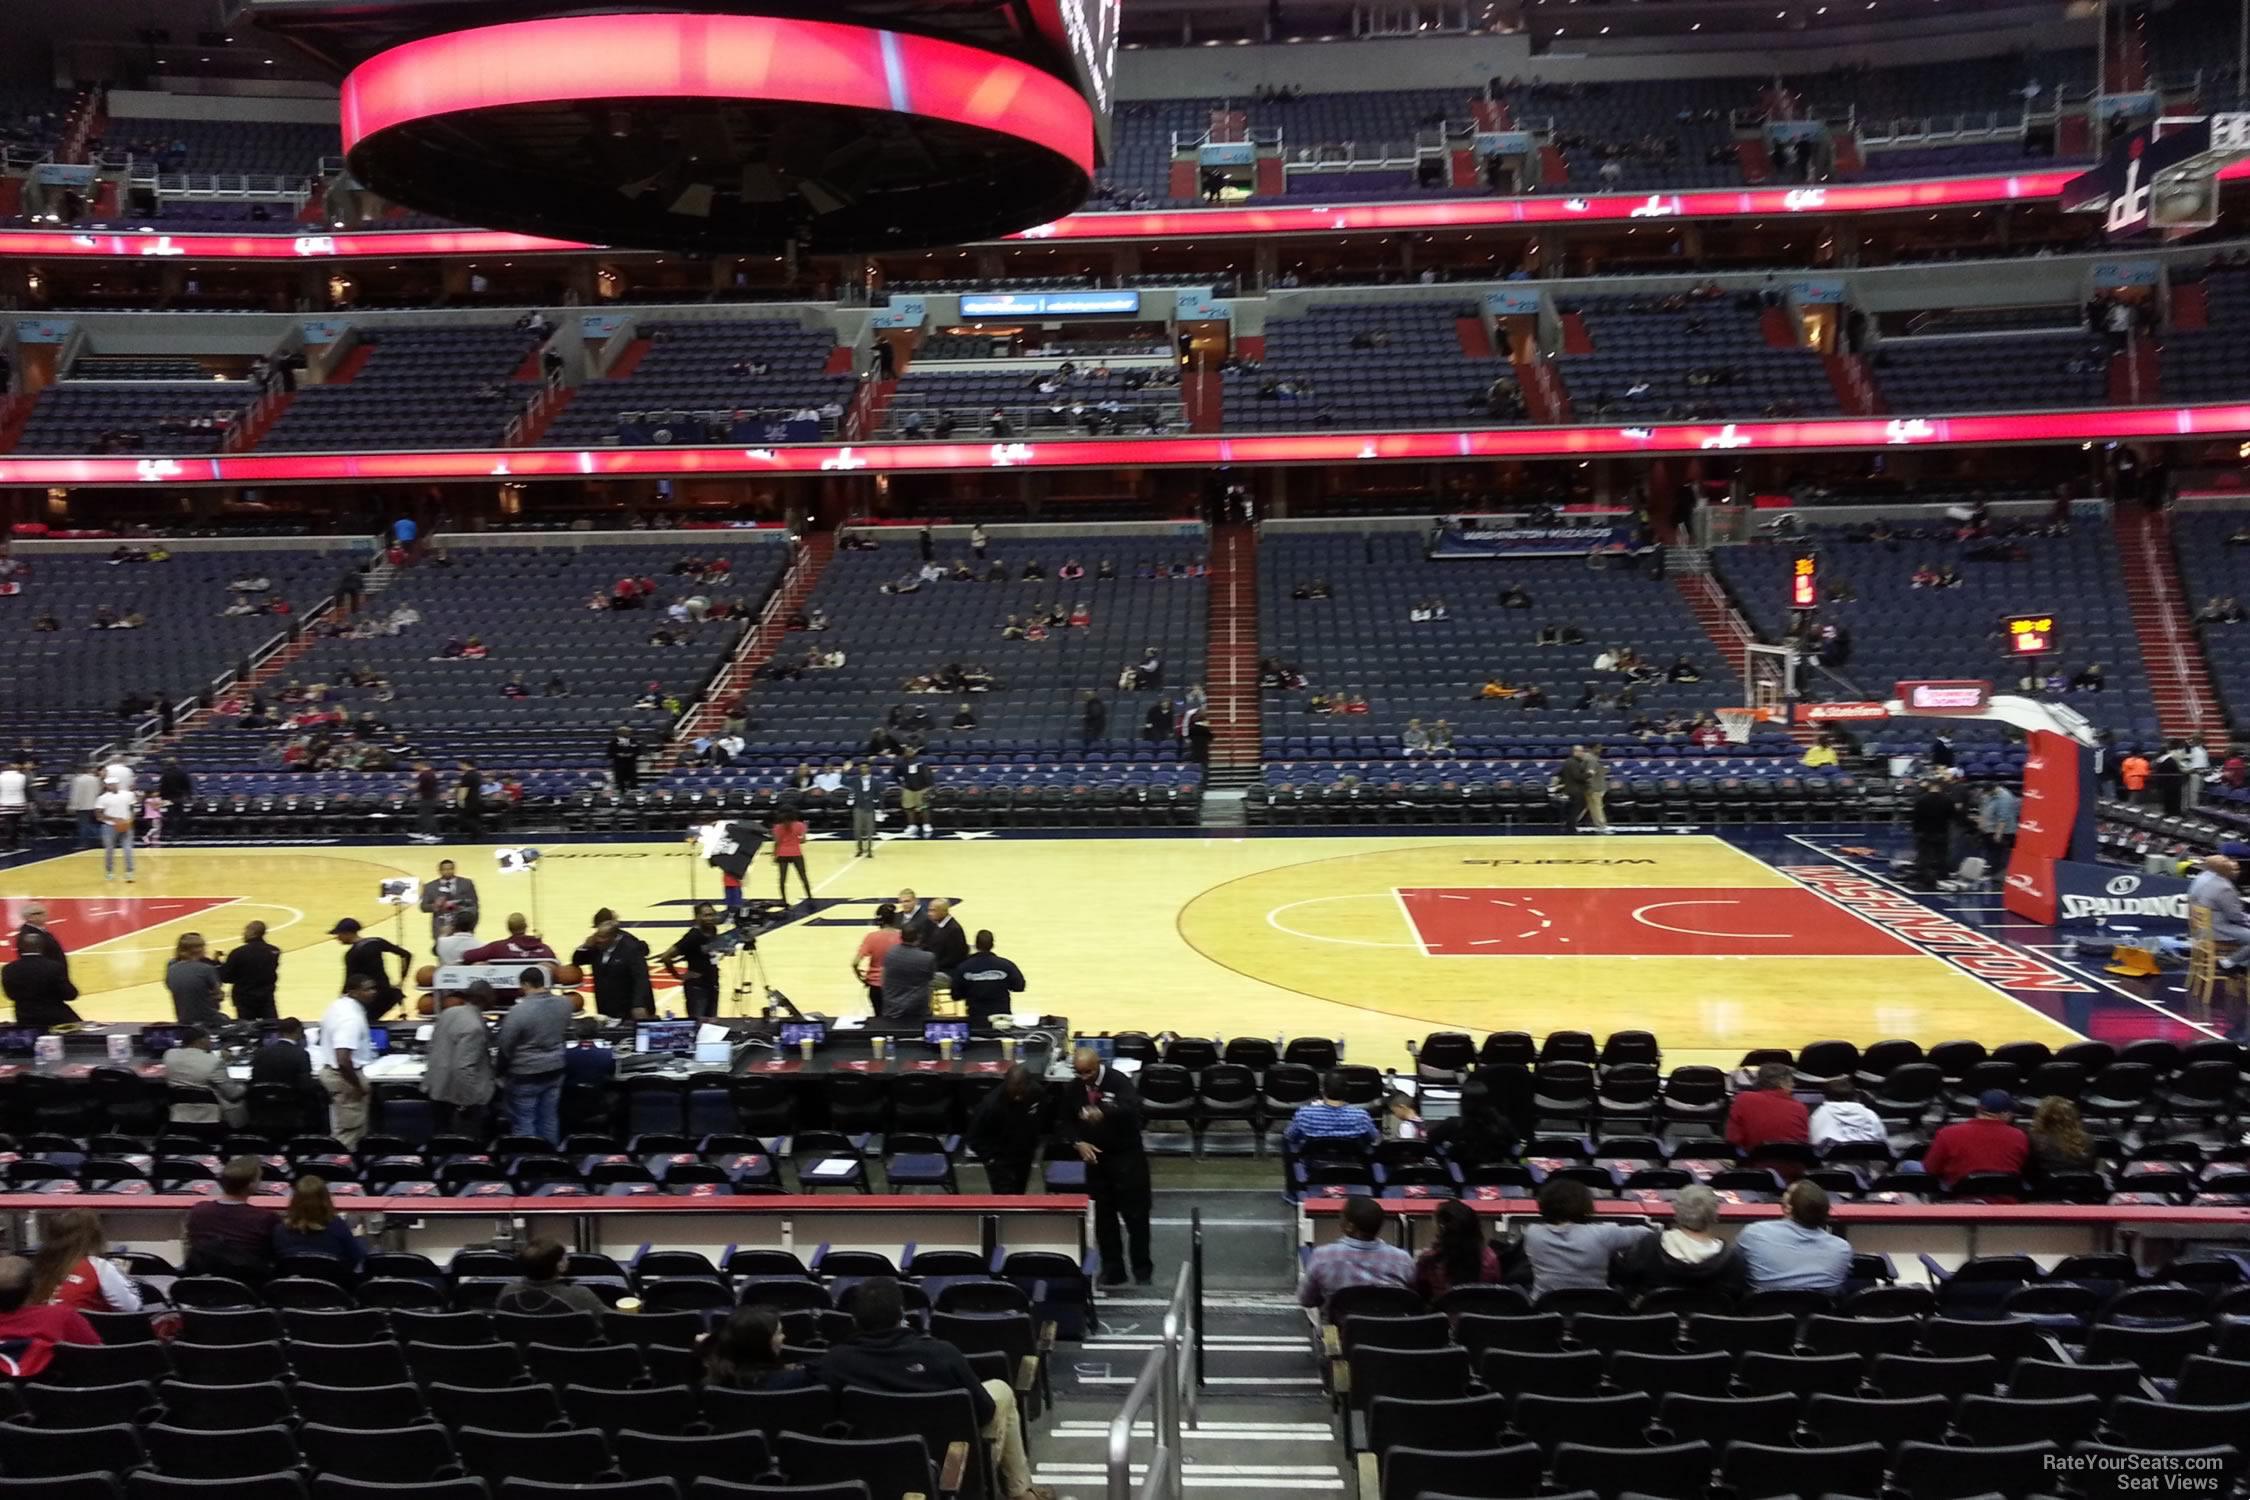 100 Level Center Verizon Center Basketball Seating